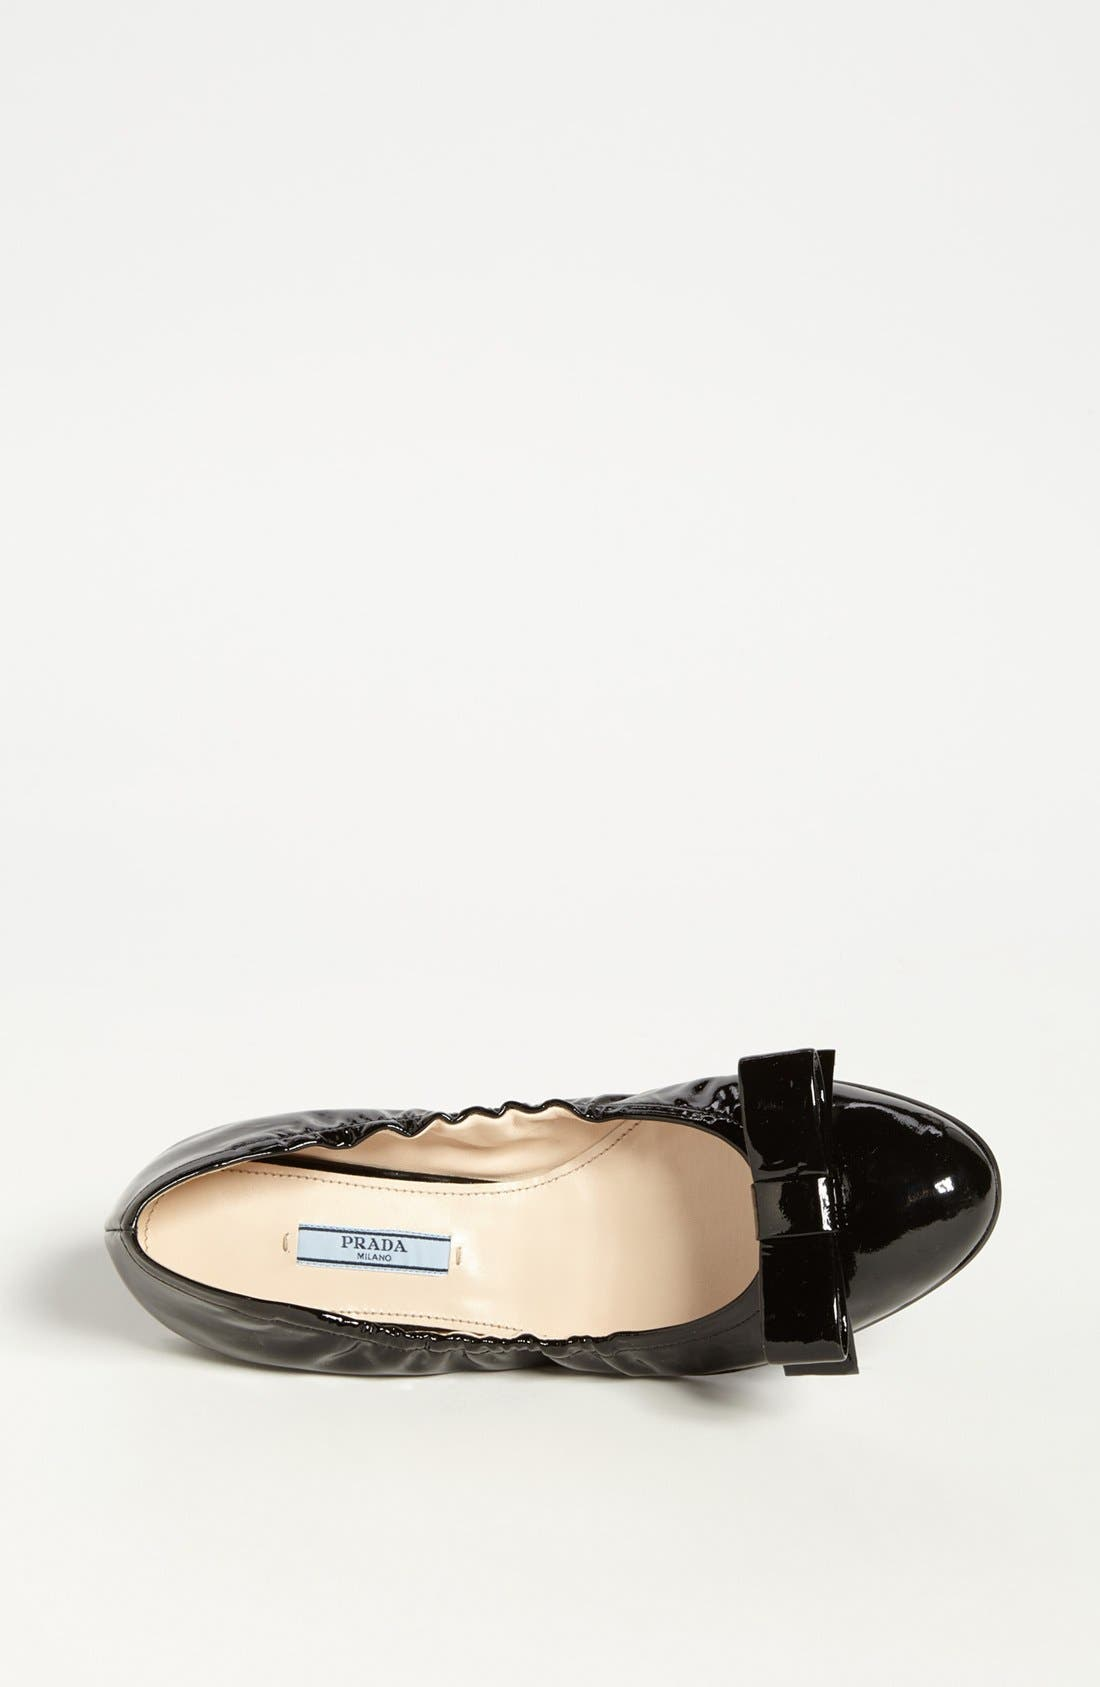 PRADA,                             Bow Ballet Flat,                             Alternate thumbnail 3, color,                             001